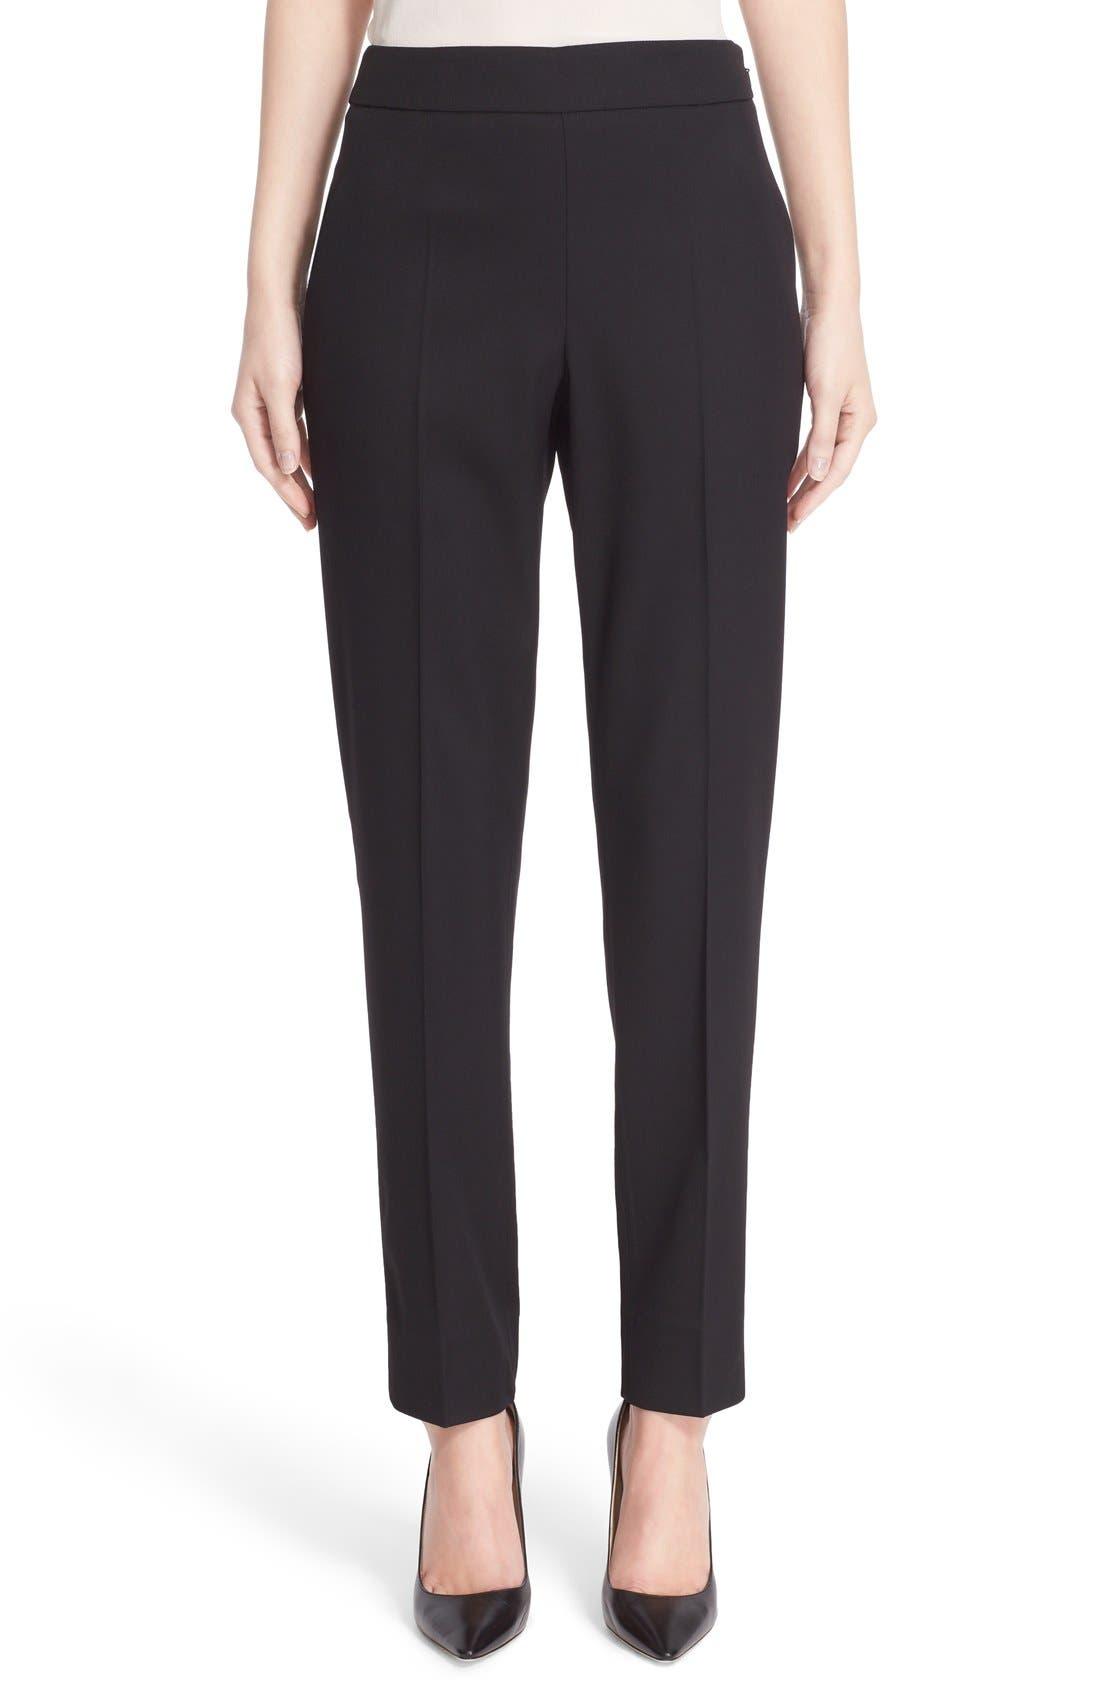 Alternate Image 1 Selected - Oscar de la Renta Stretch Wool Straight Leg Pants